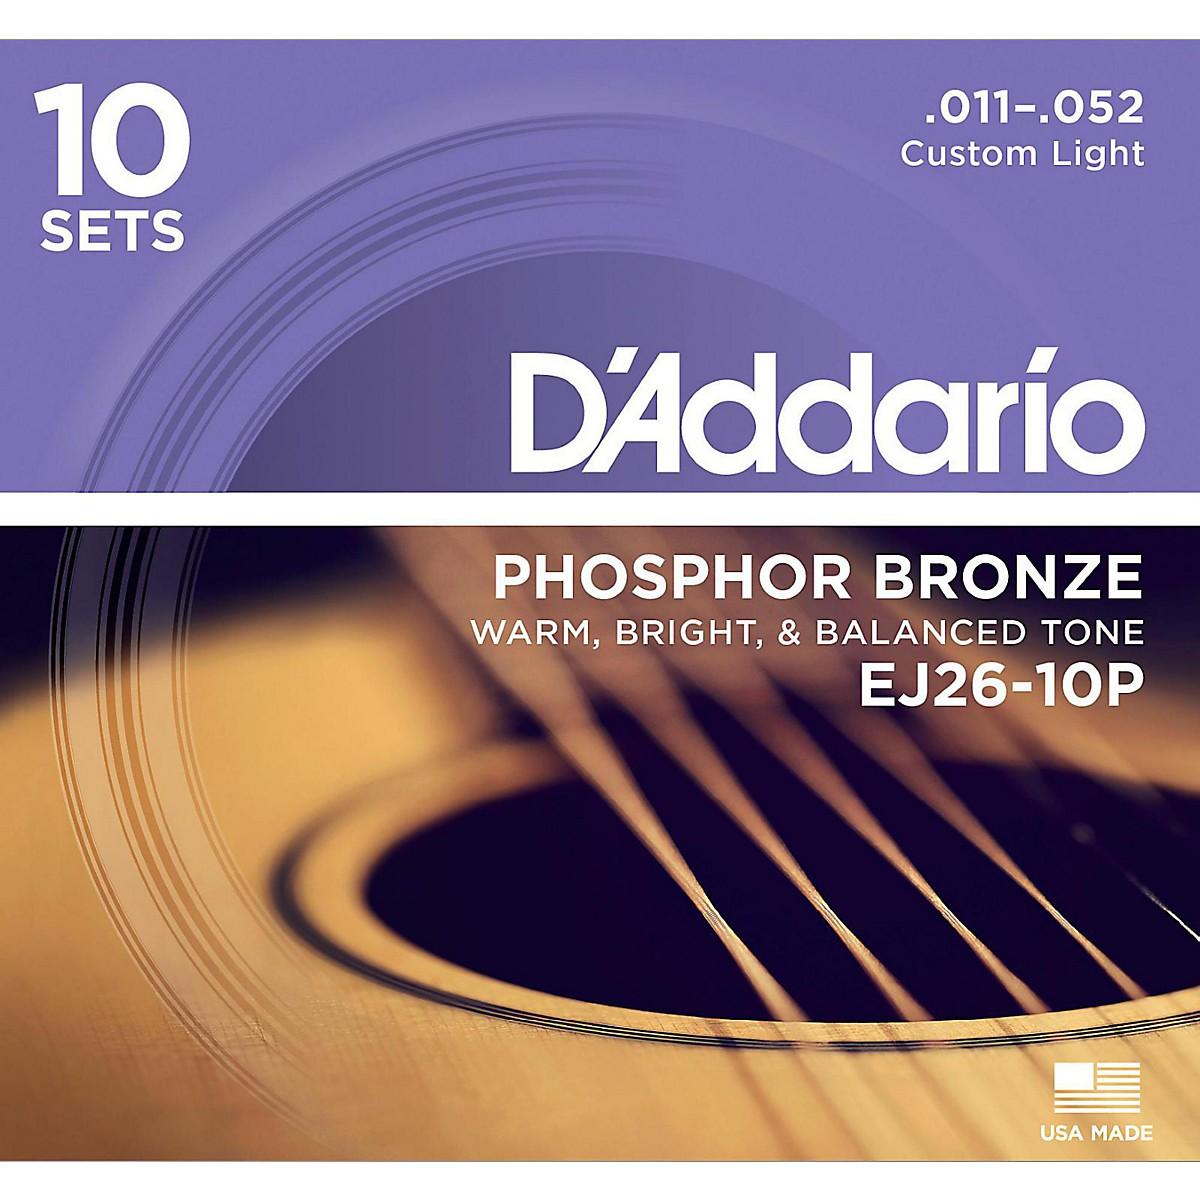 D'Addario EJ2610-P 10-Pack Custom Light Acoustic Guitar Strings